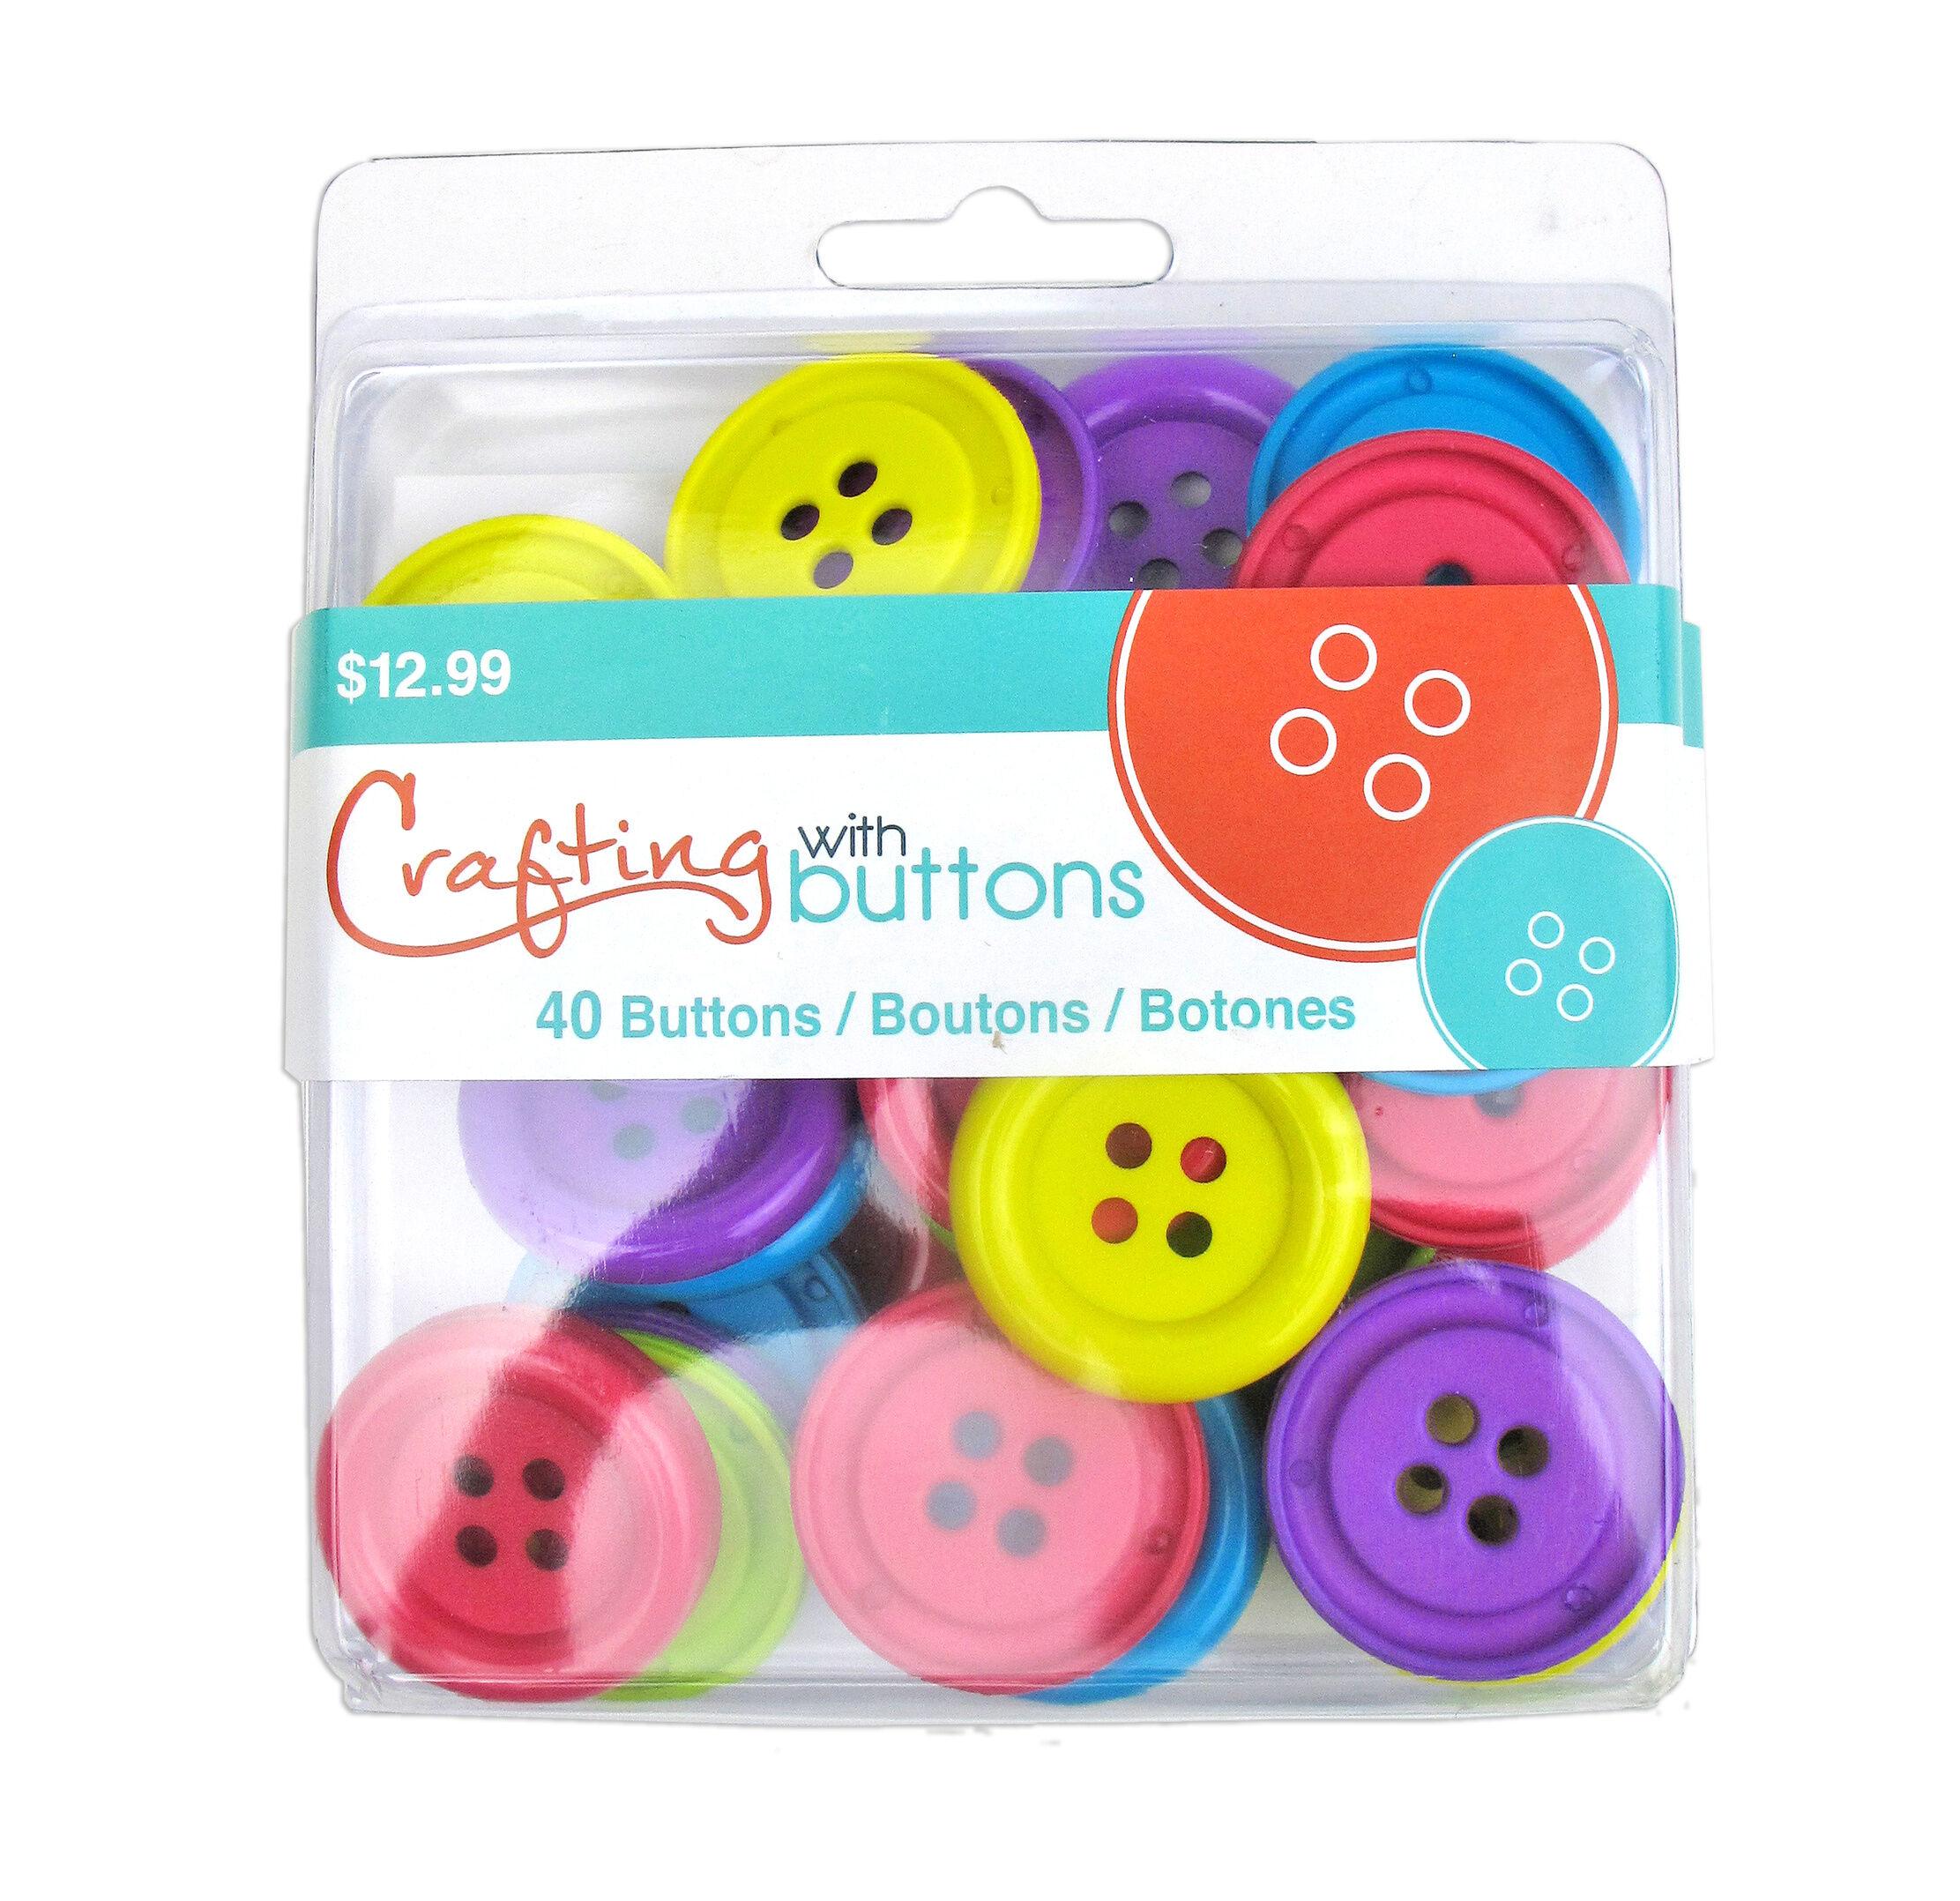 la-petite-sewing-buttons